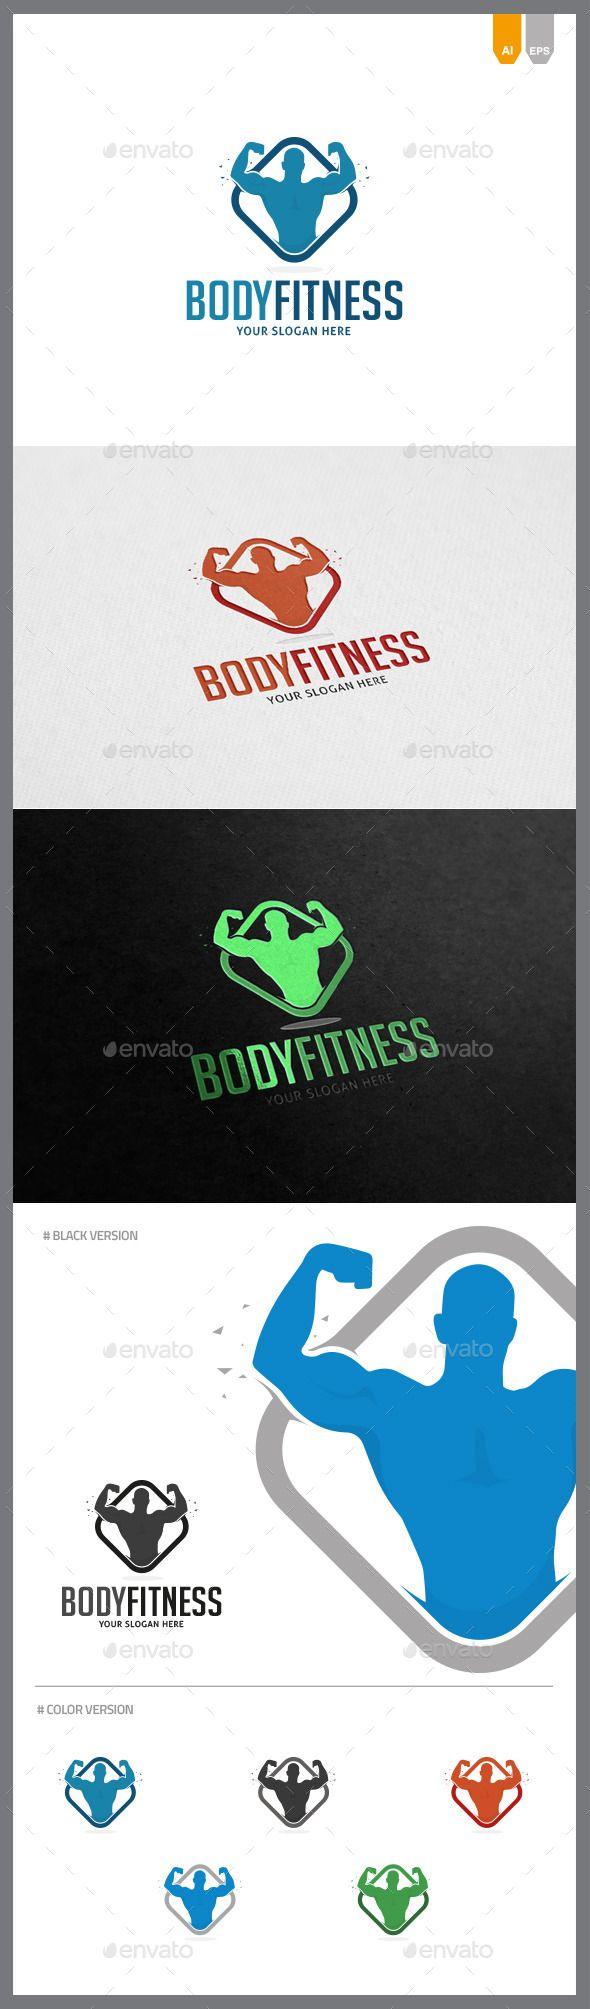 Body Fitness  - Logo Design Template Vector #logotype Download it here: http://graphicriver.net/item/body-fitness-logo/9657017?s_rank=972?ref=nesto